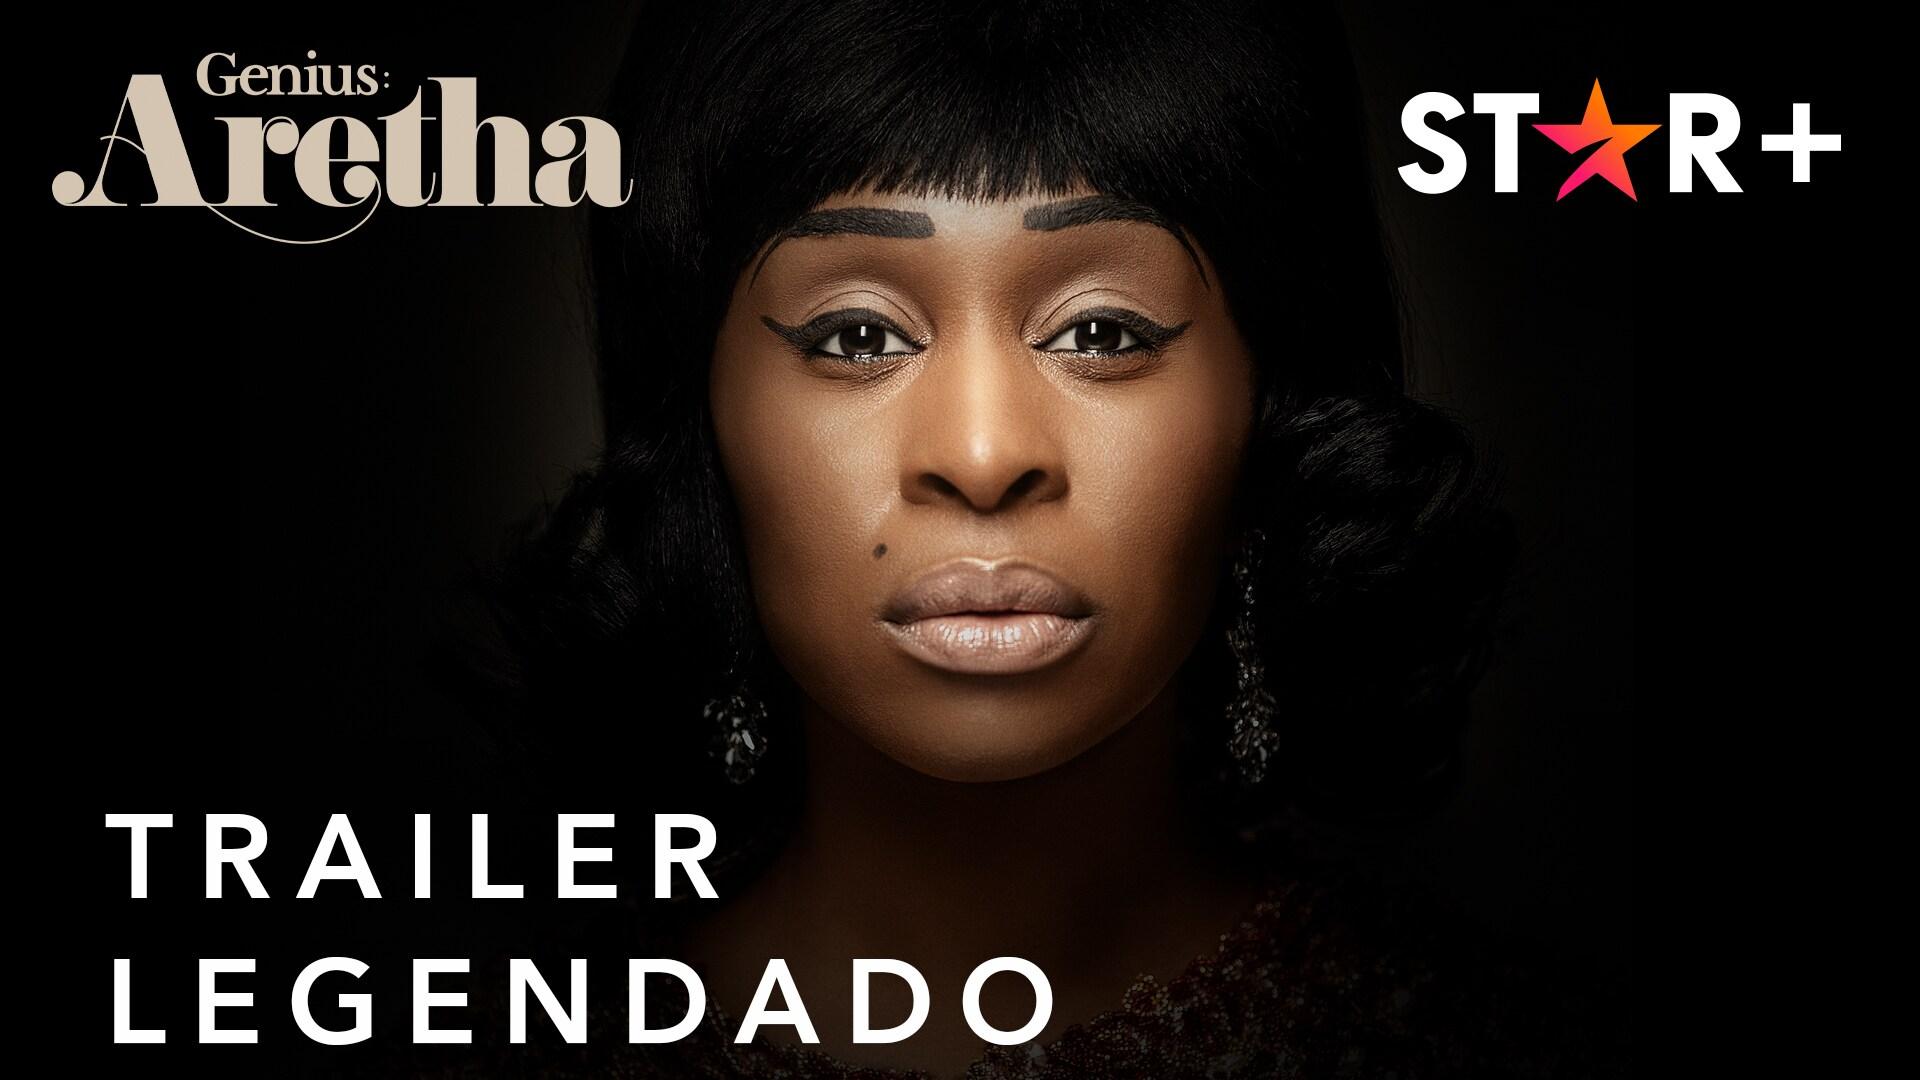 Genius: Aretha | Trailer Legendado | Star+